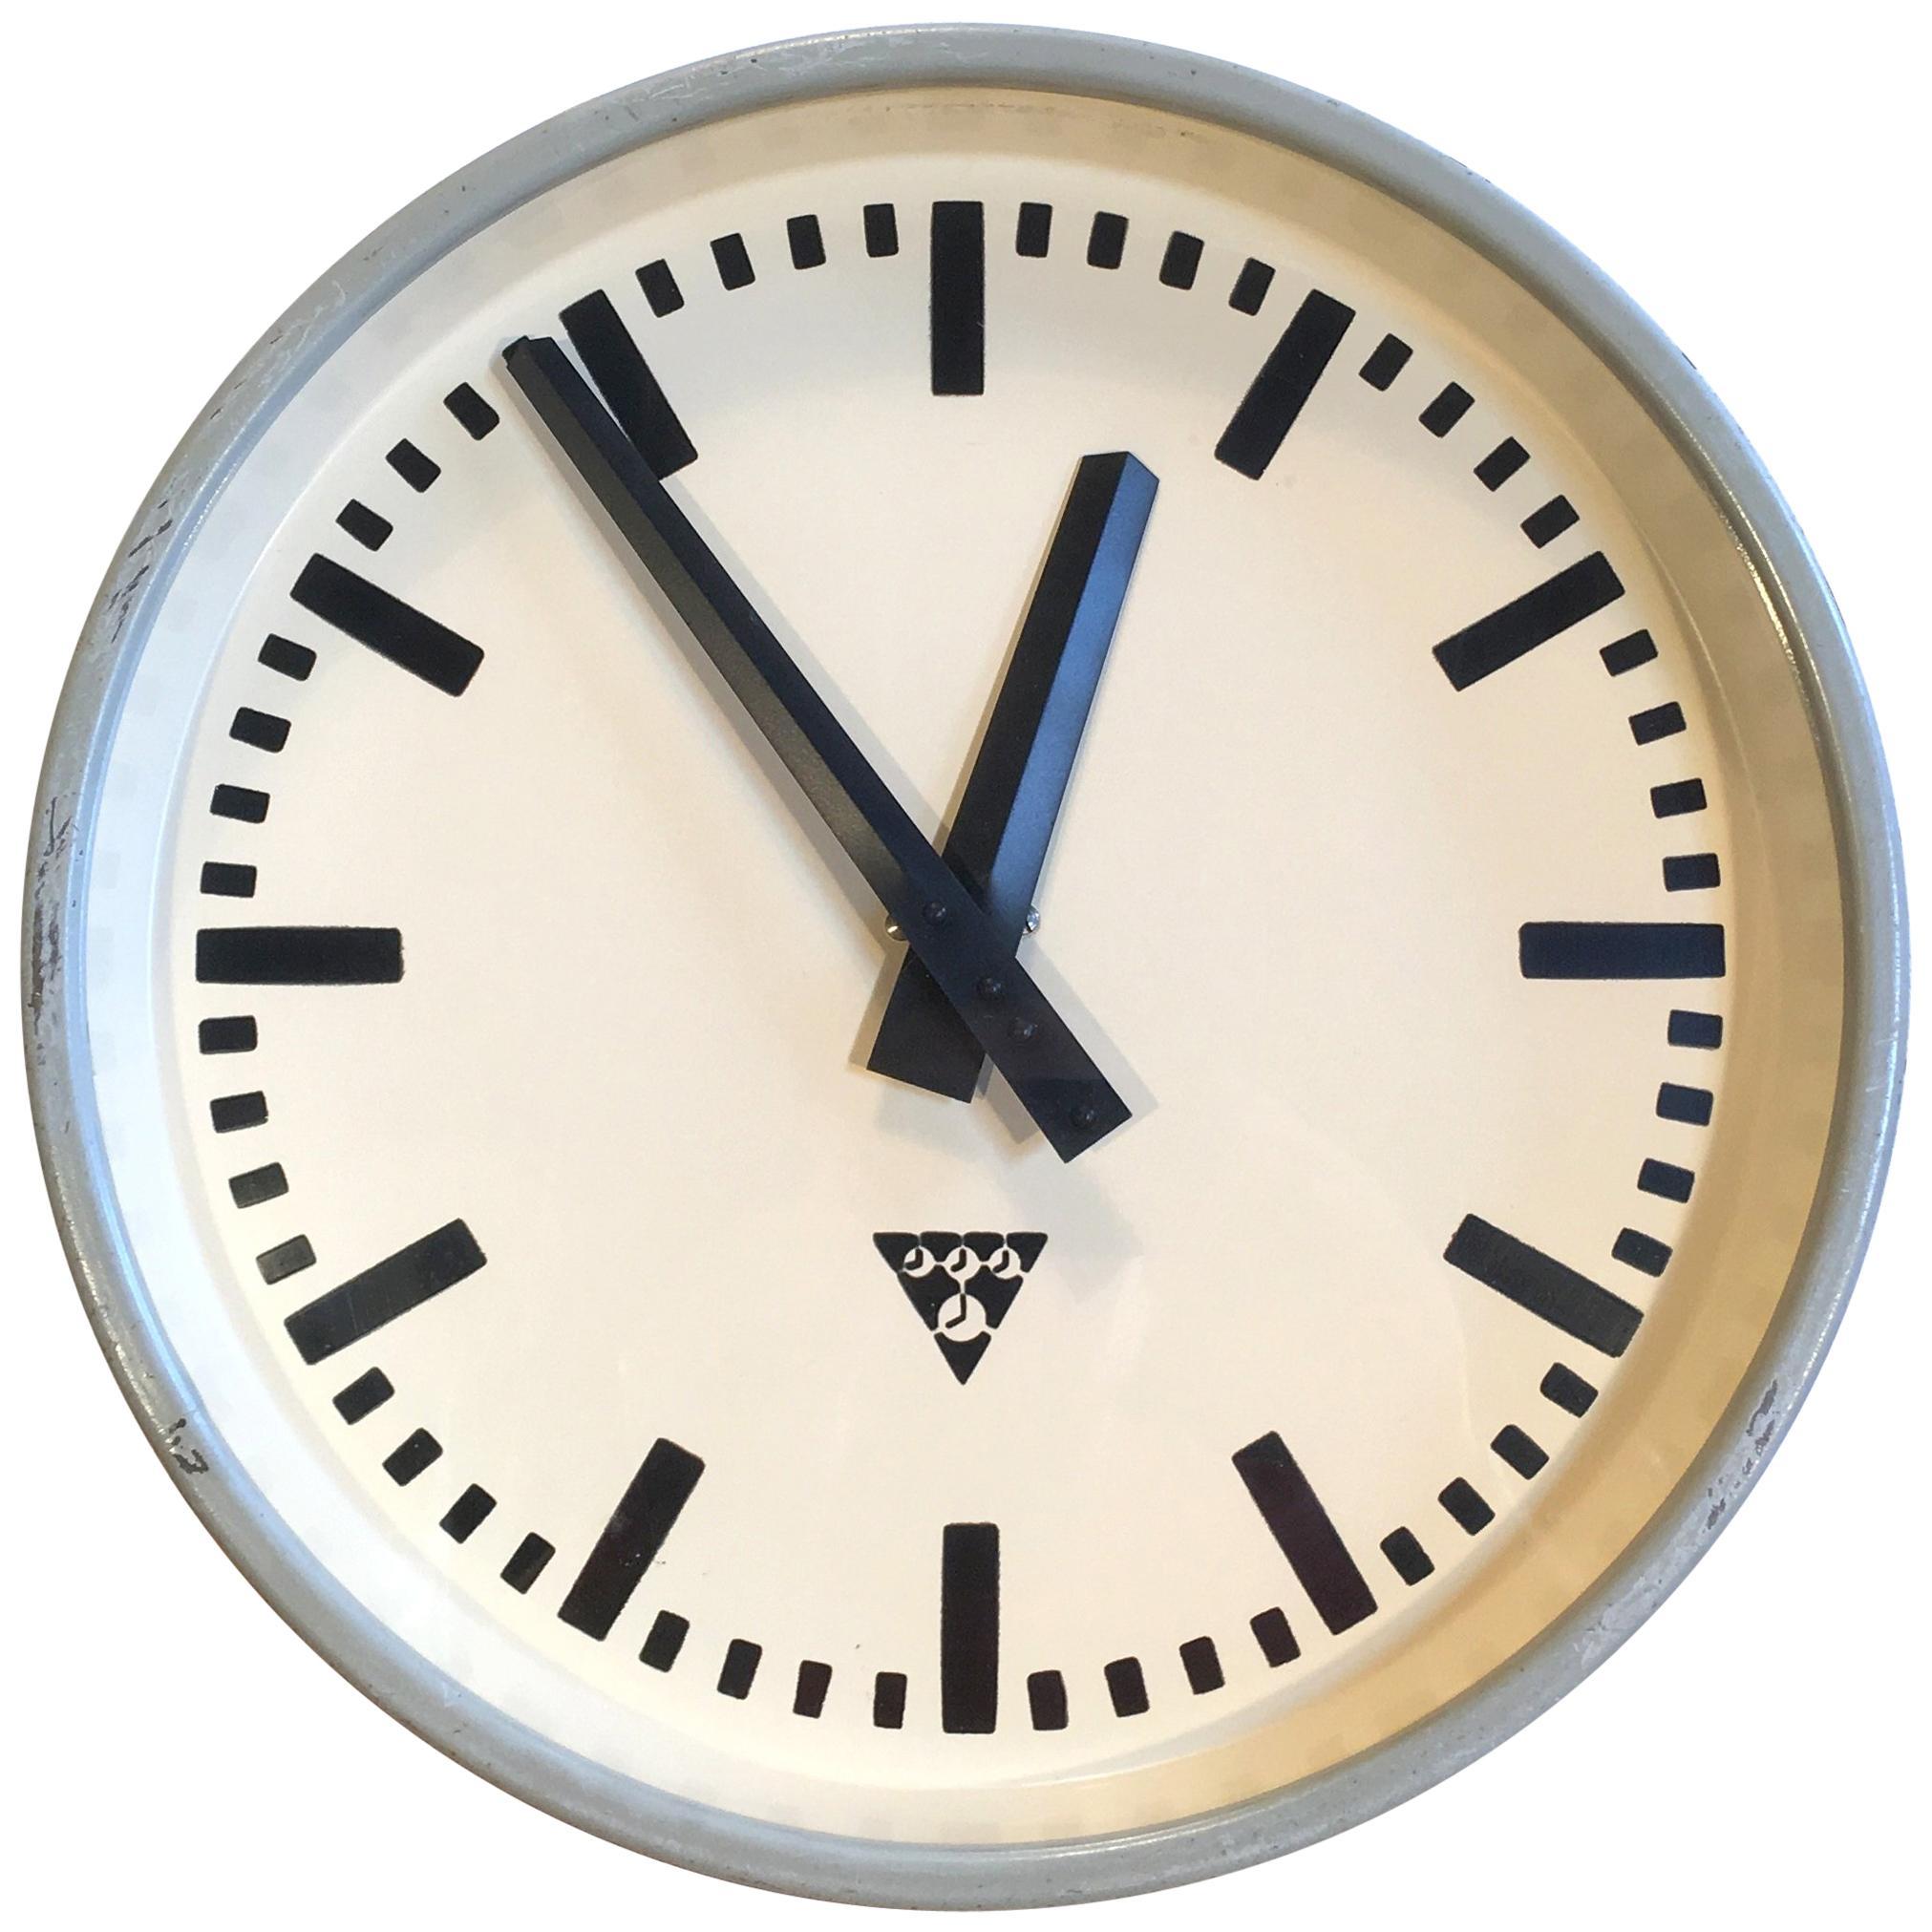 Made By Pragotron Vintage Industrial Wall Clock Metal Buy Now former Czechoslovakia